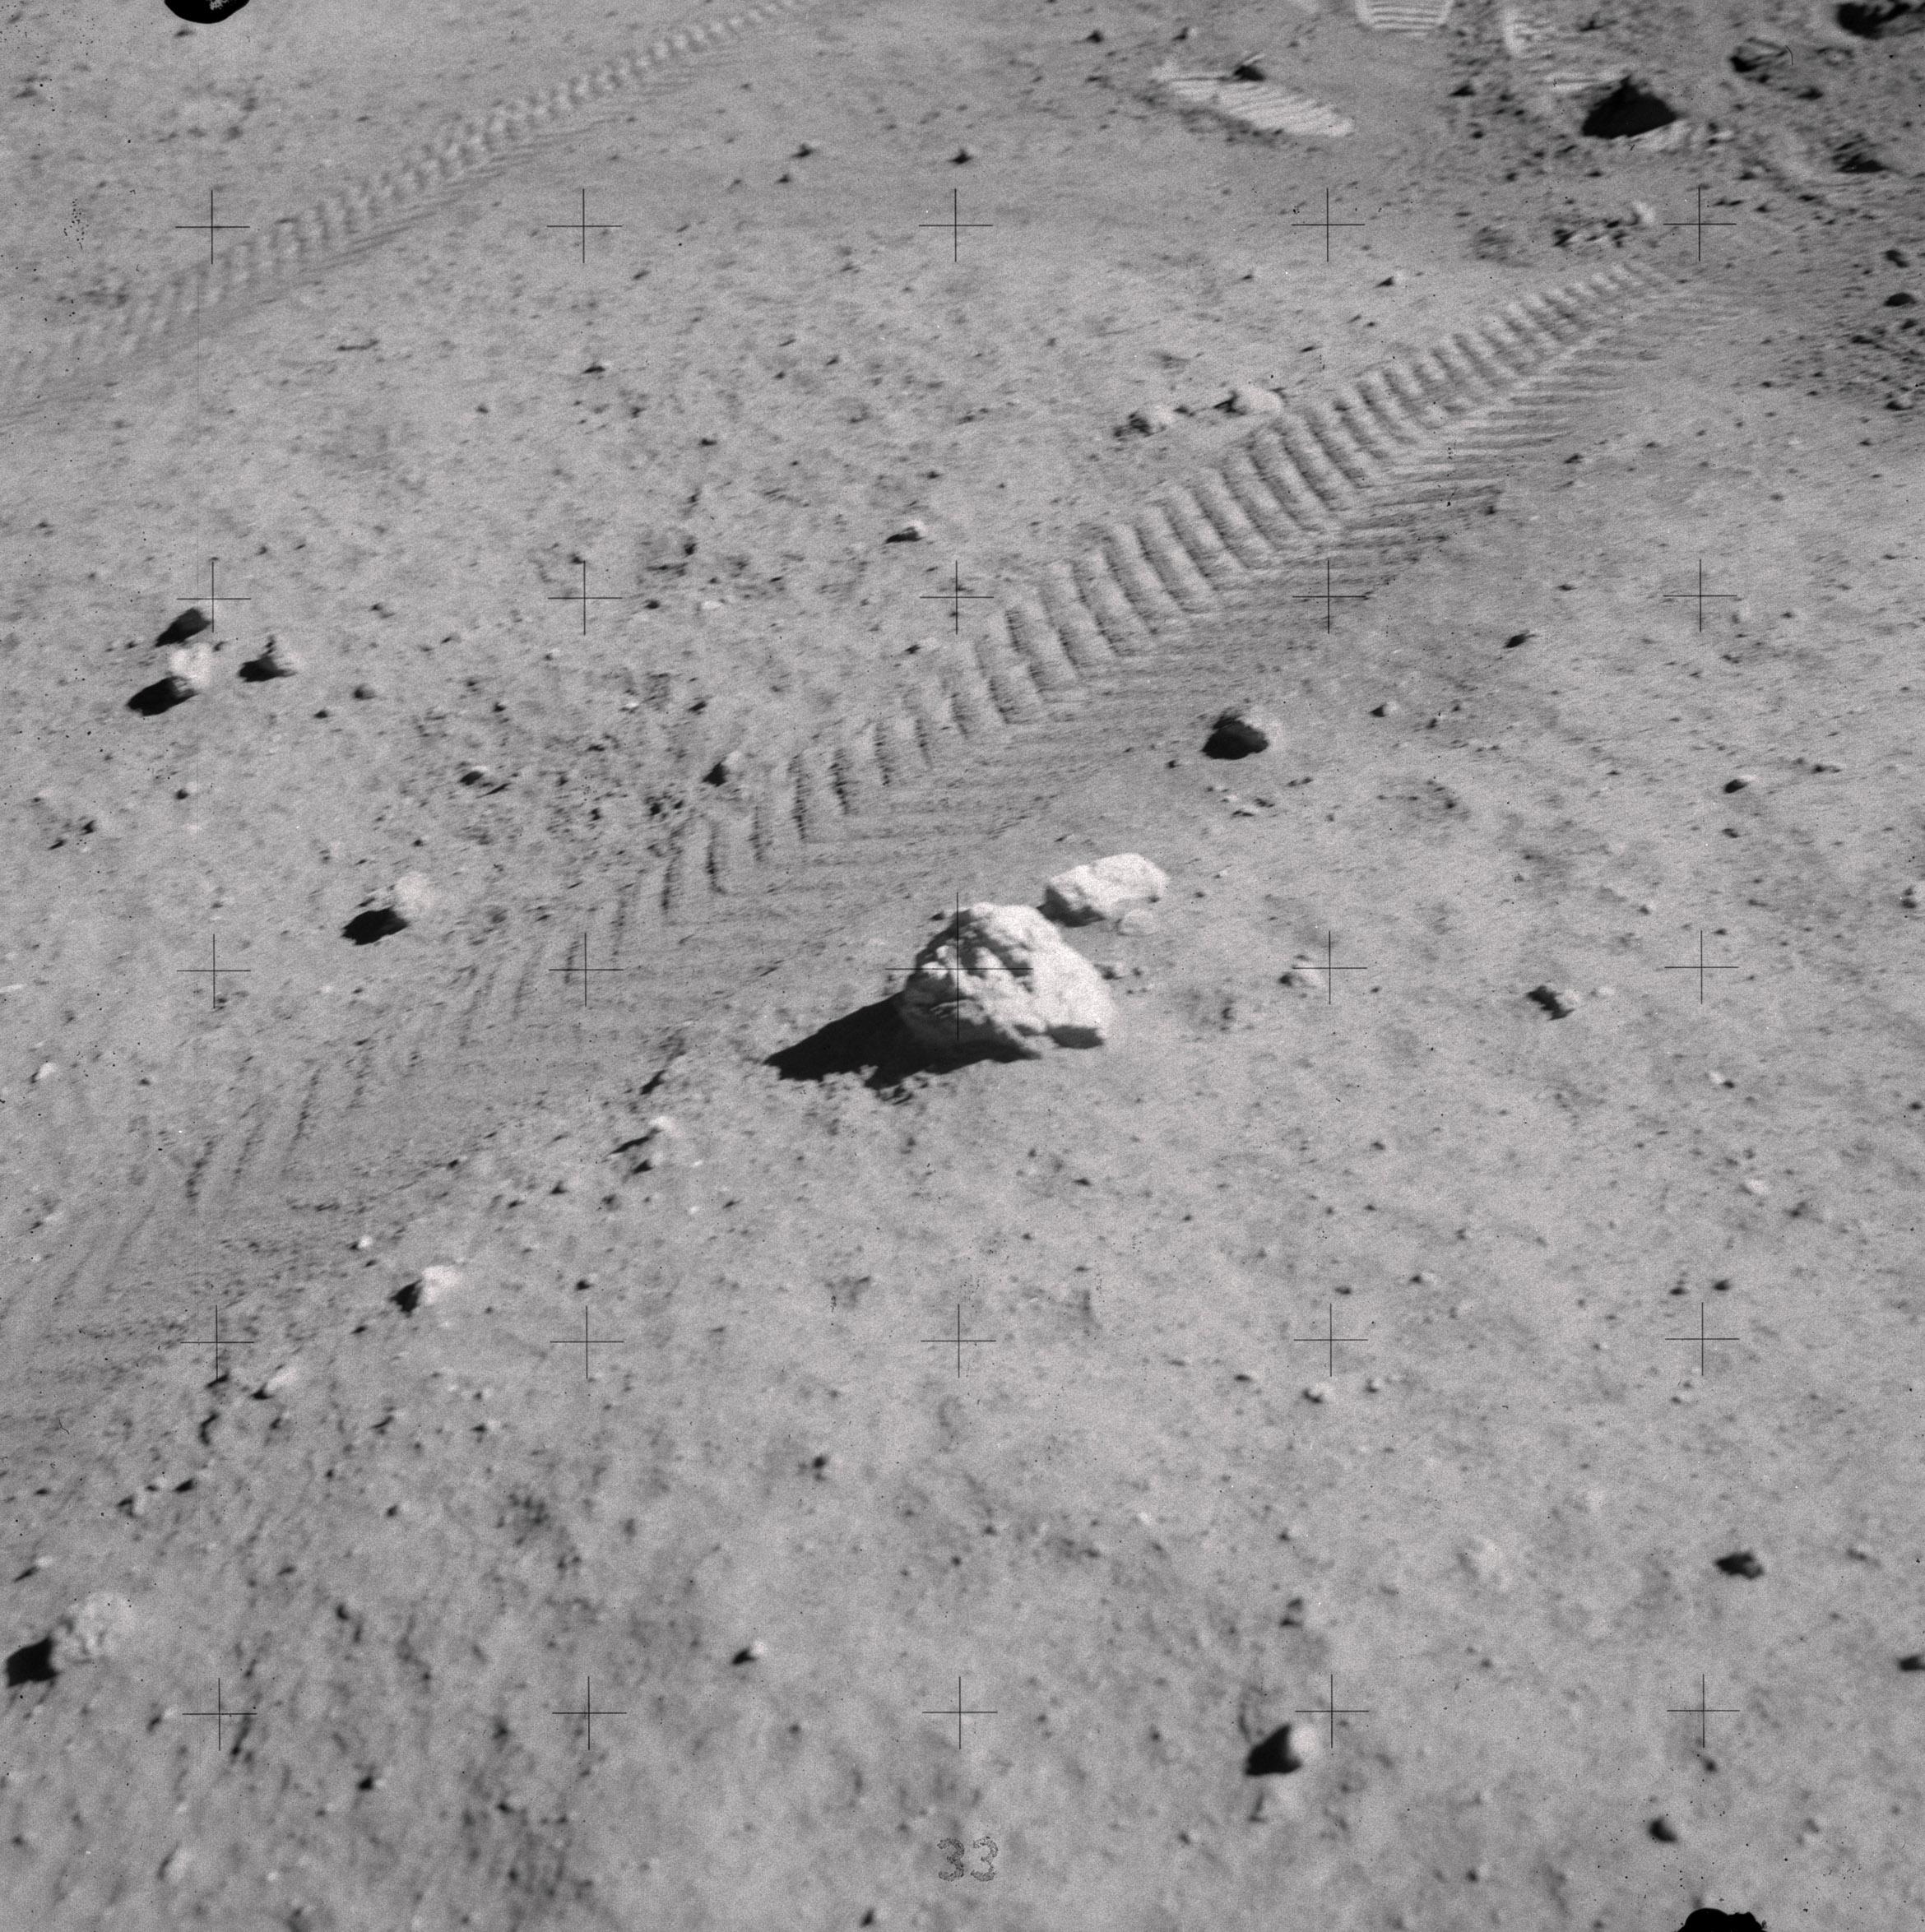 Lunar Anorthosite Surface Sample